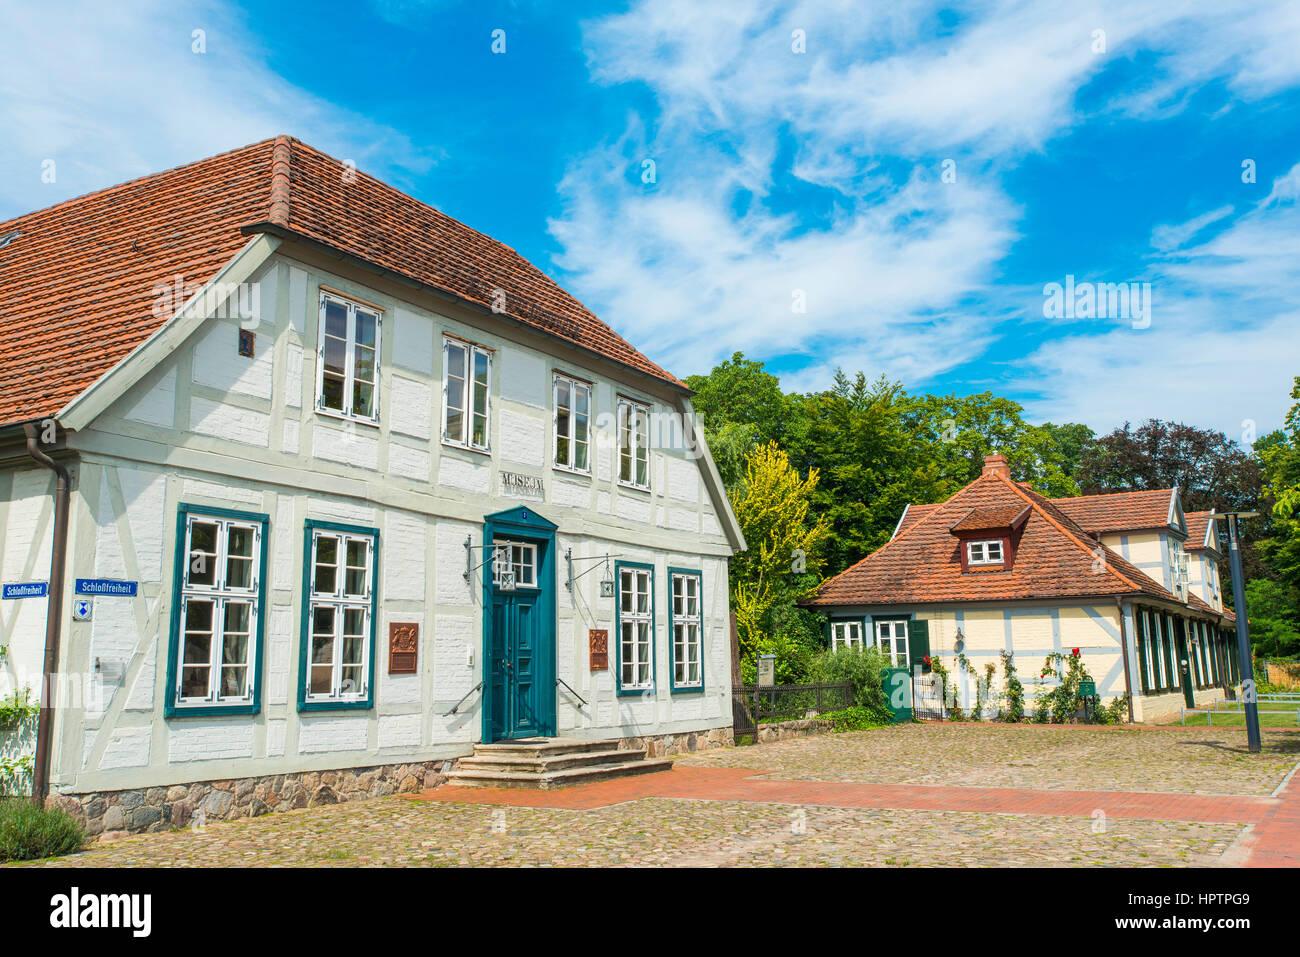 Framework houses at the place of castle Ludwigslust, Mecklenburg-West Pomerania, Germany - Stock Image